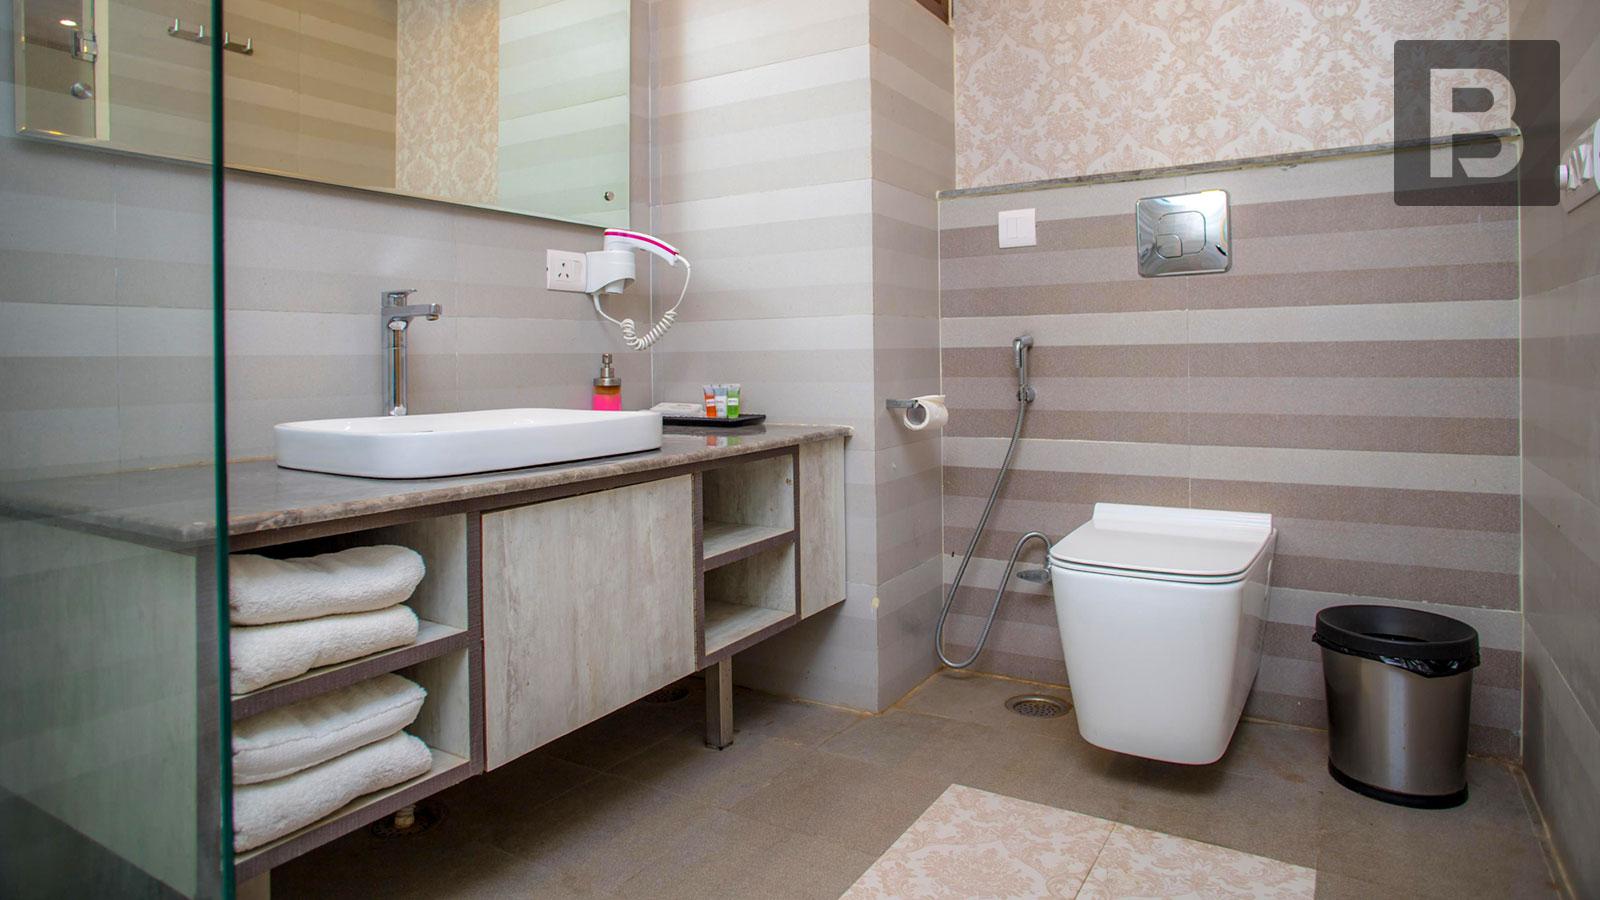 Beyond Stay Vasavana Resort, Corbett